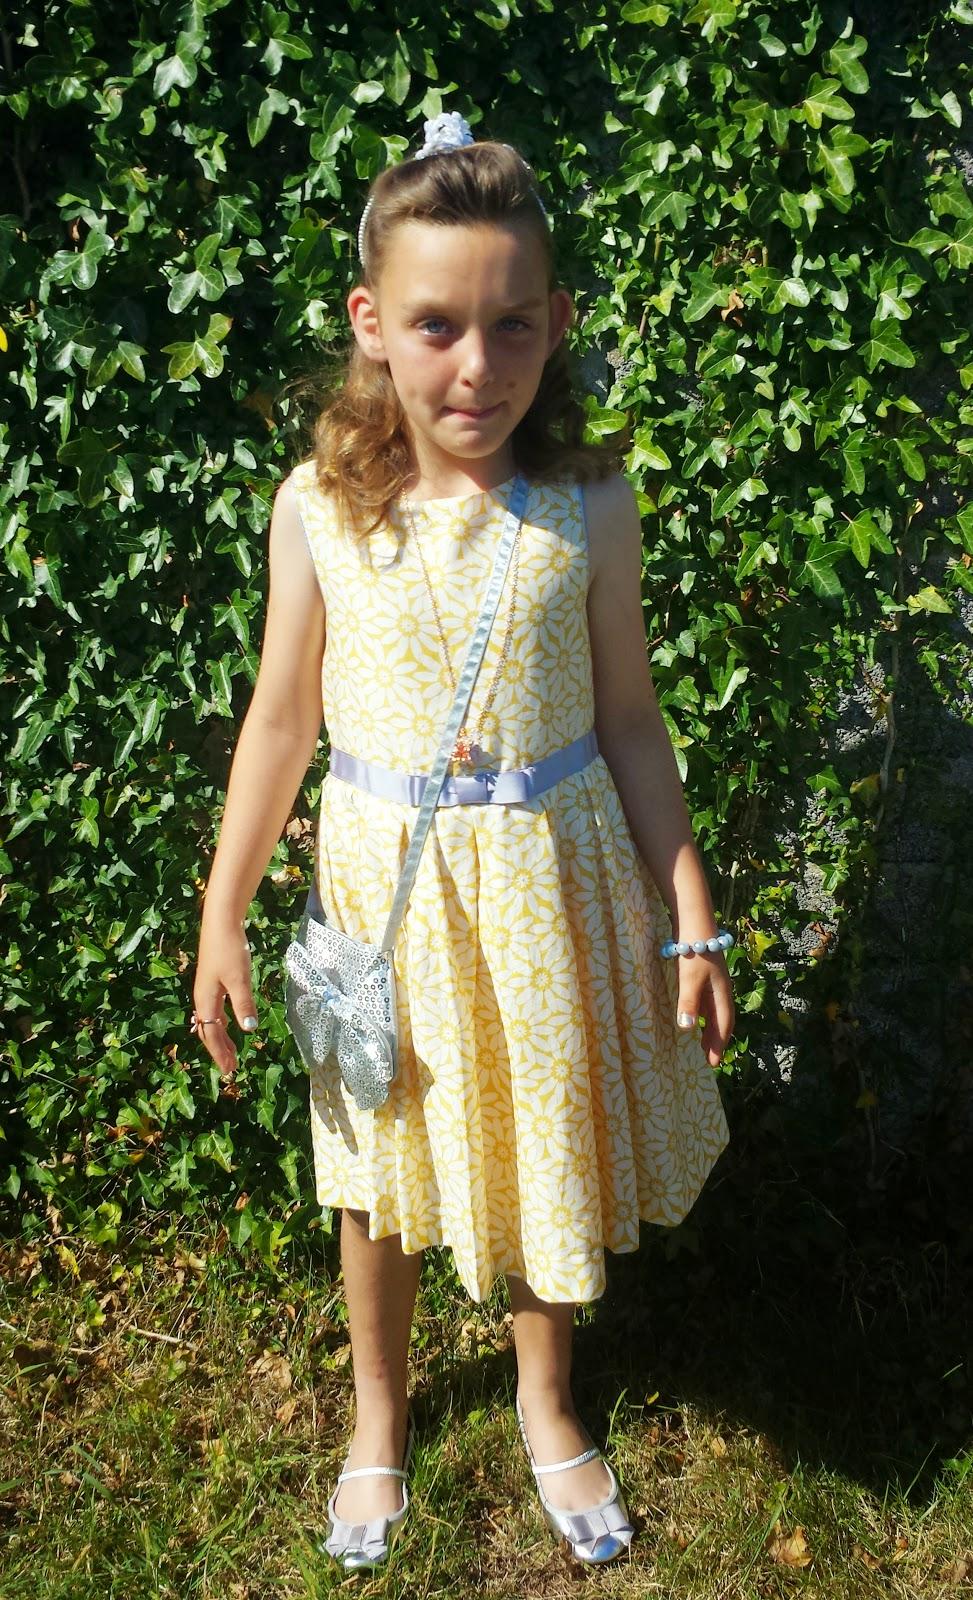 Rebecca Big Brownie Birthday 100 Ball M&S Yellow Floral Dress Style Fashion